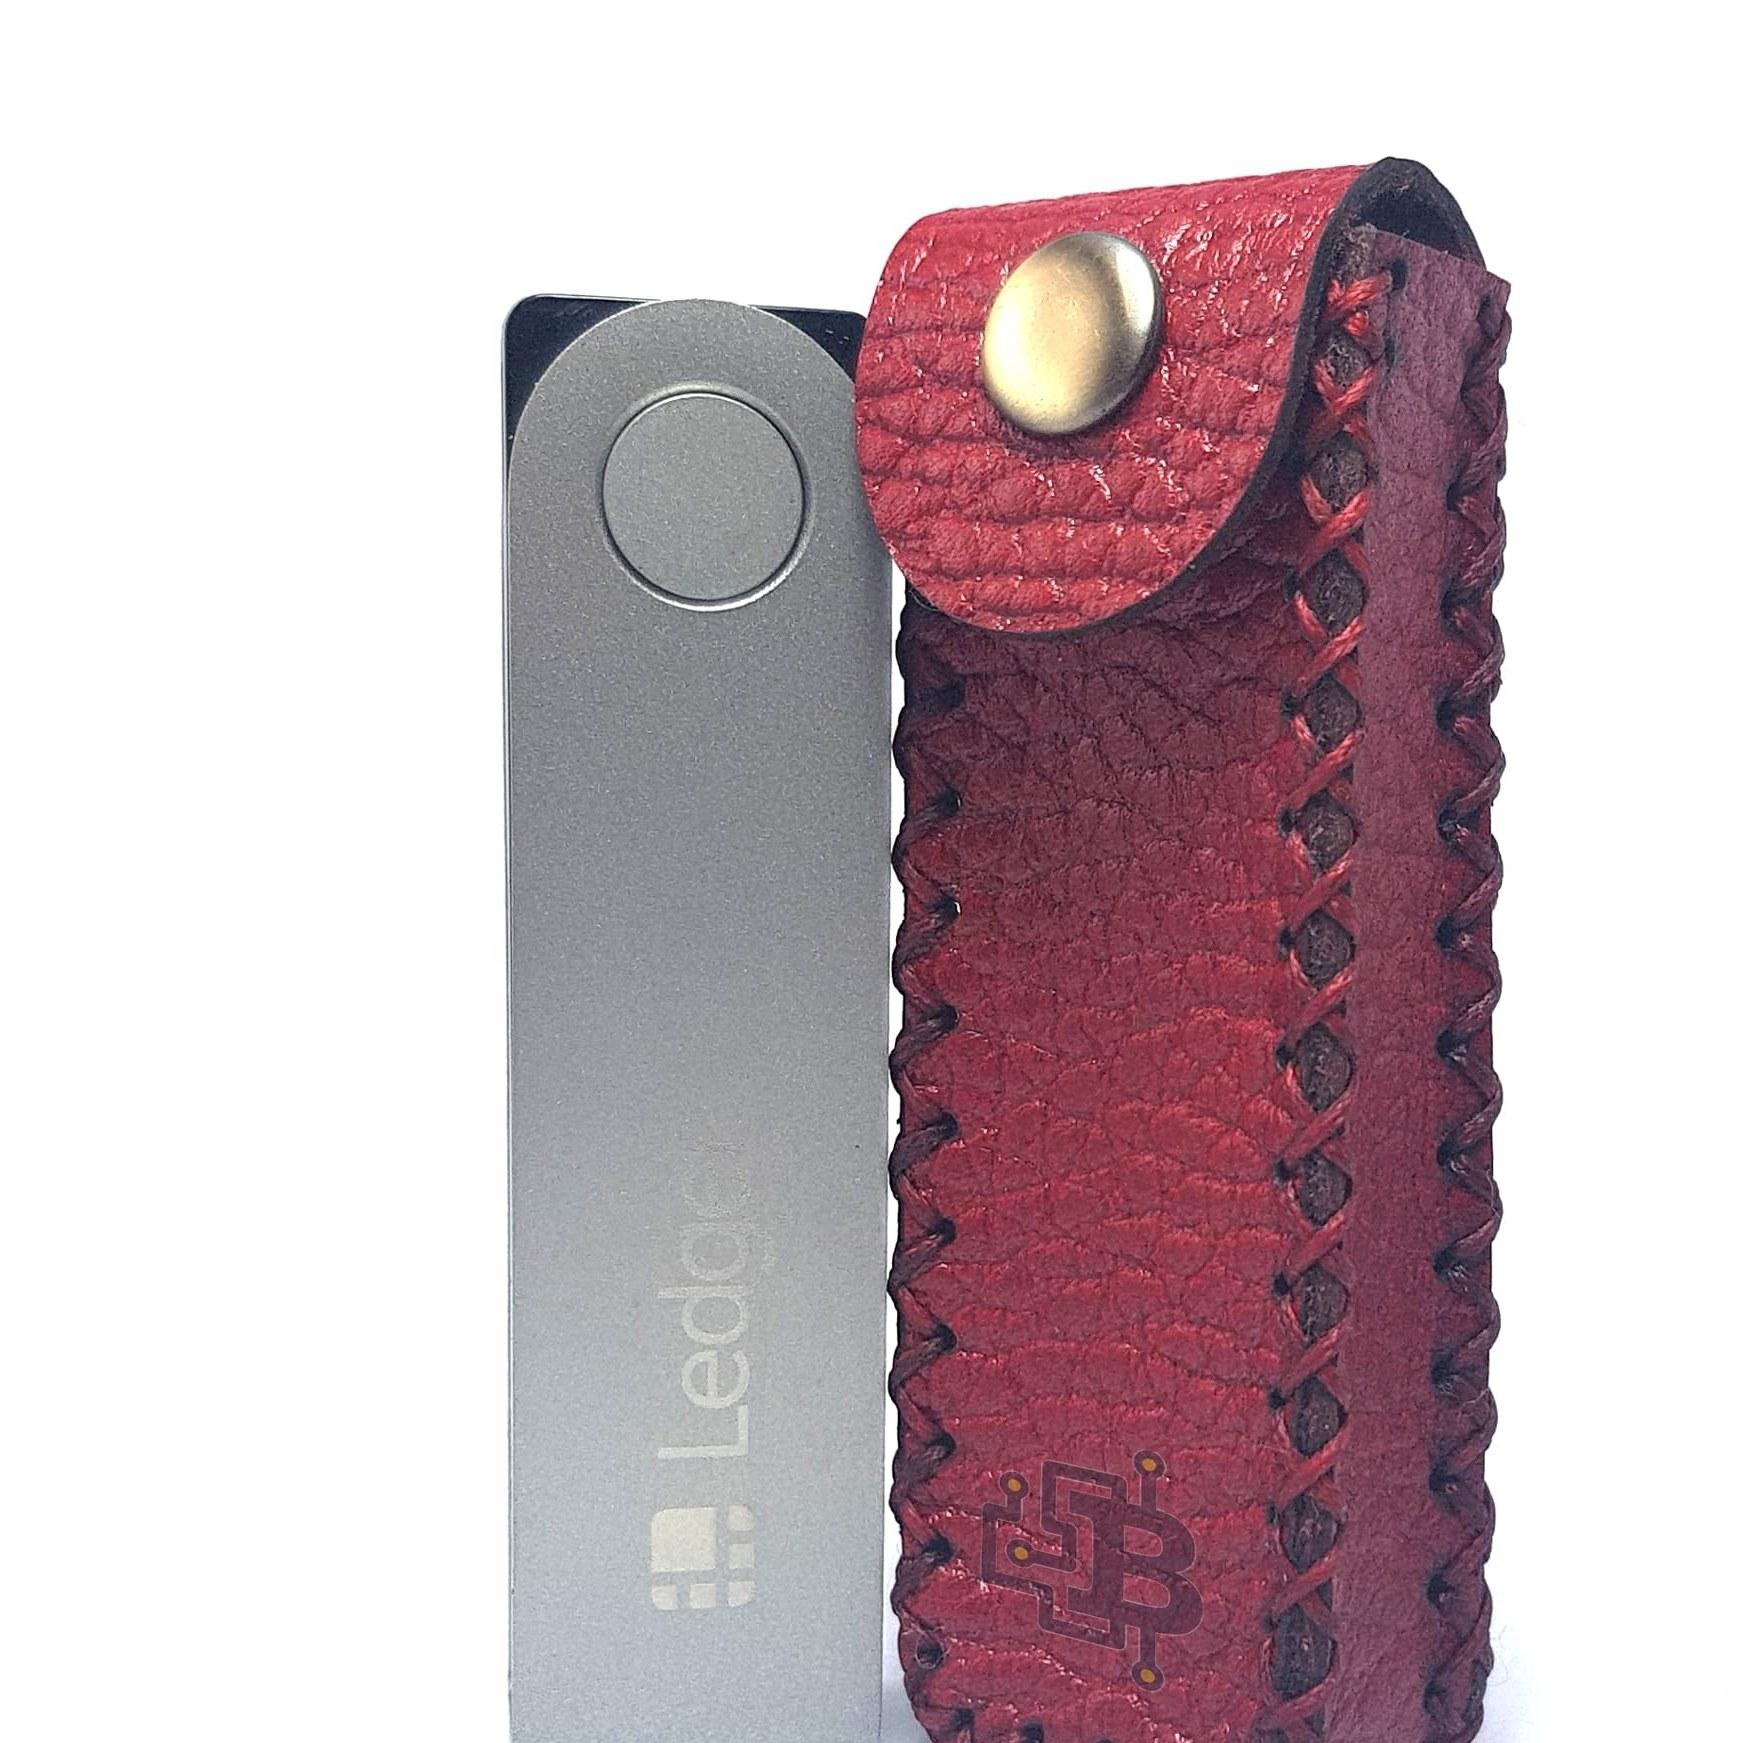 تصویر کیس چرم طبیعی گاوی مناسب کیف پول لجر نانو ایکس – Ledger Nano X Natural Cow Leather Case